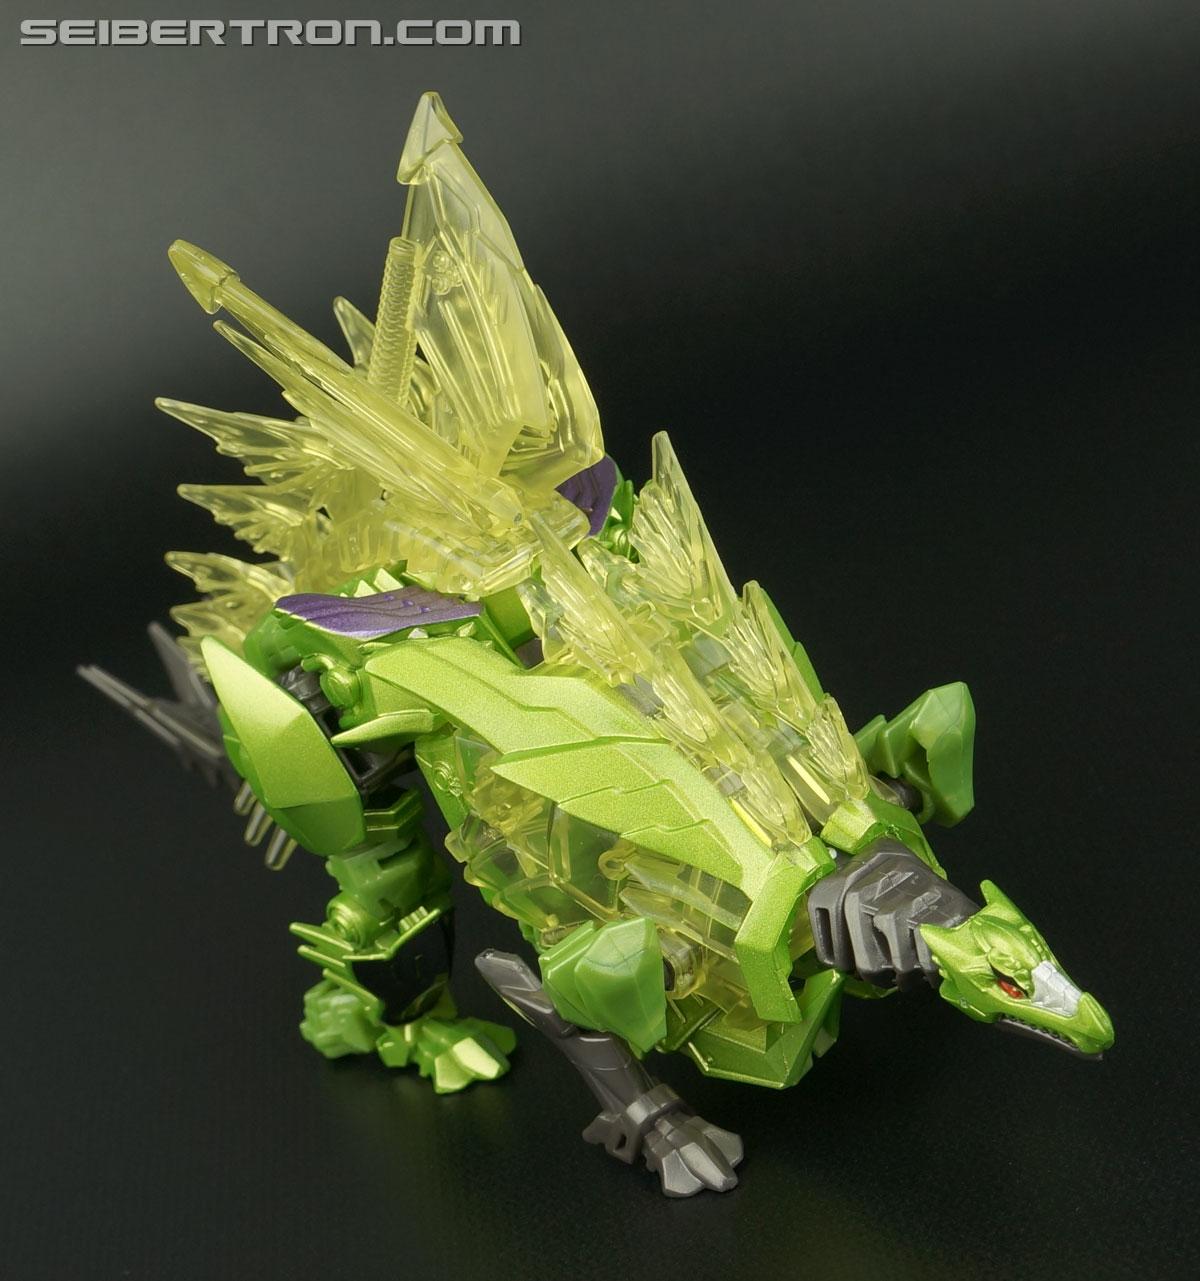 Transformers Takara Tomy: Movie Advanced Snarl (Image #23 of 154)